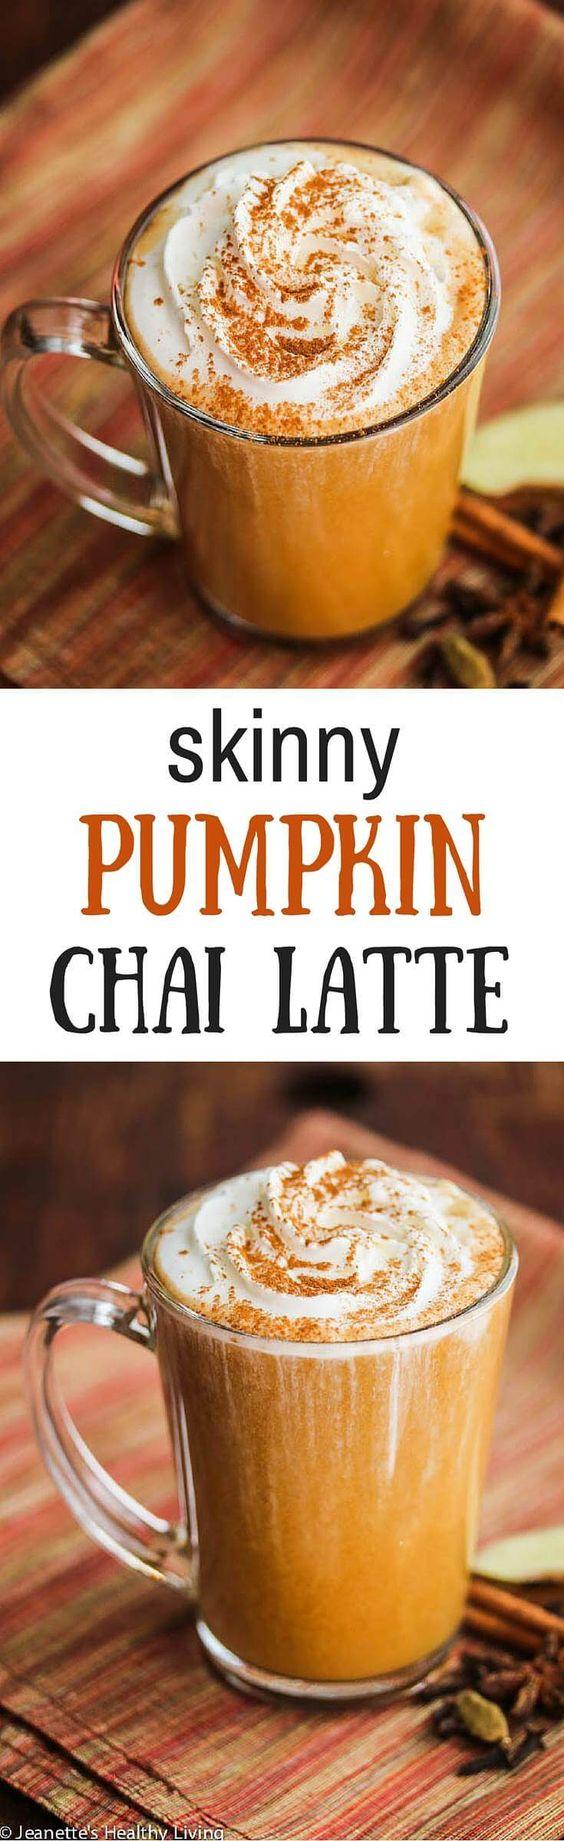 spiced pumpkin skinny pumpkin spiced latte skinny pumpkin spice latte ...